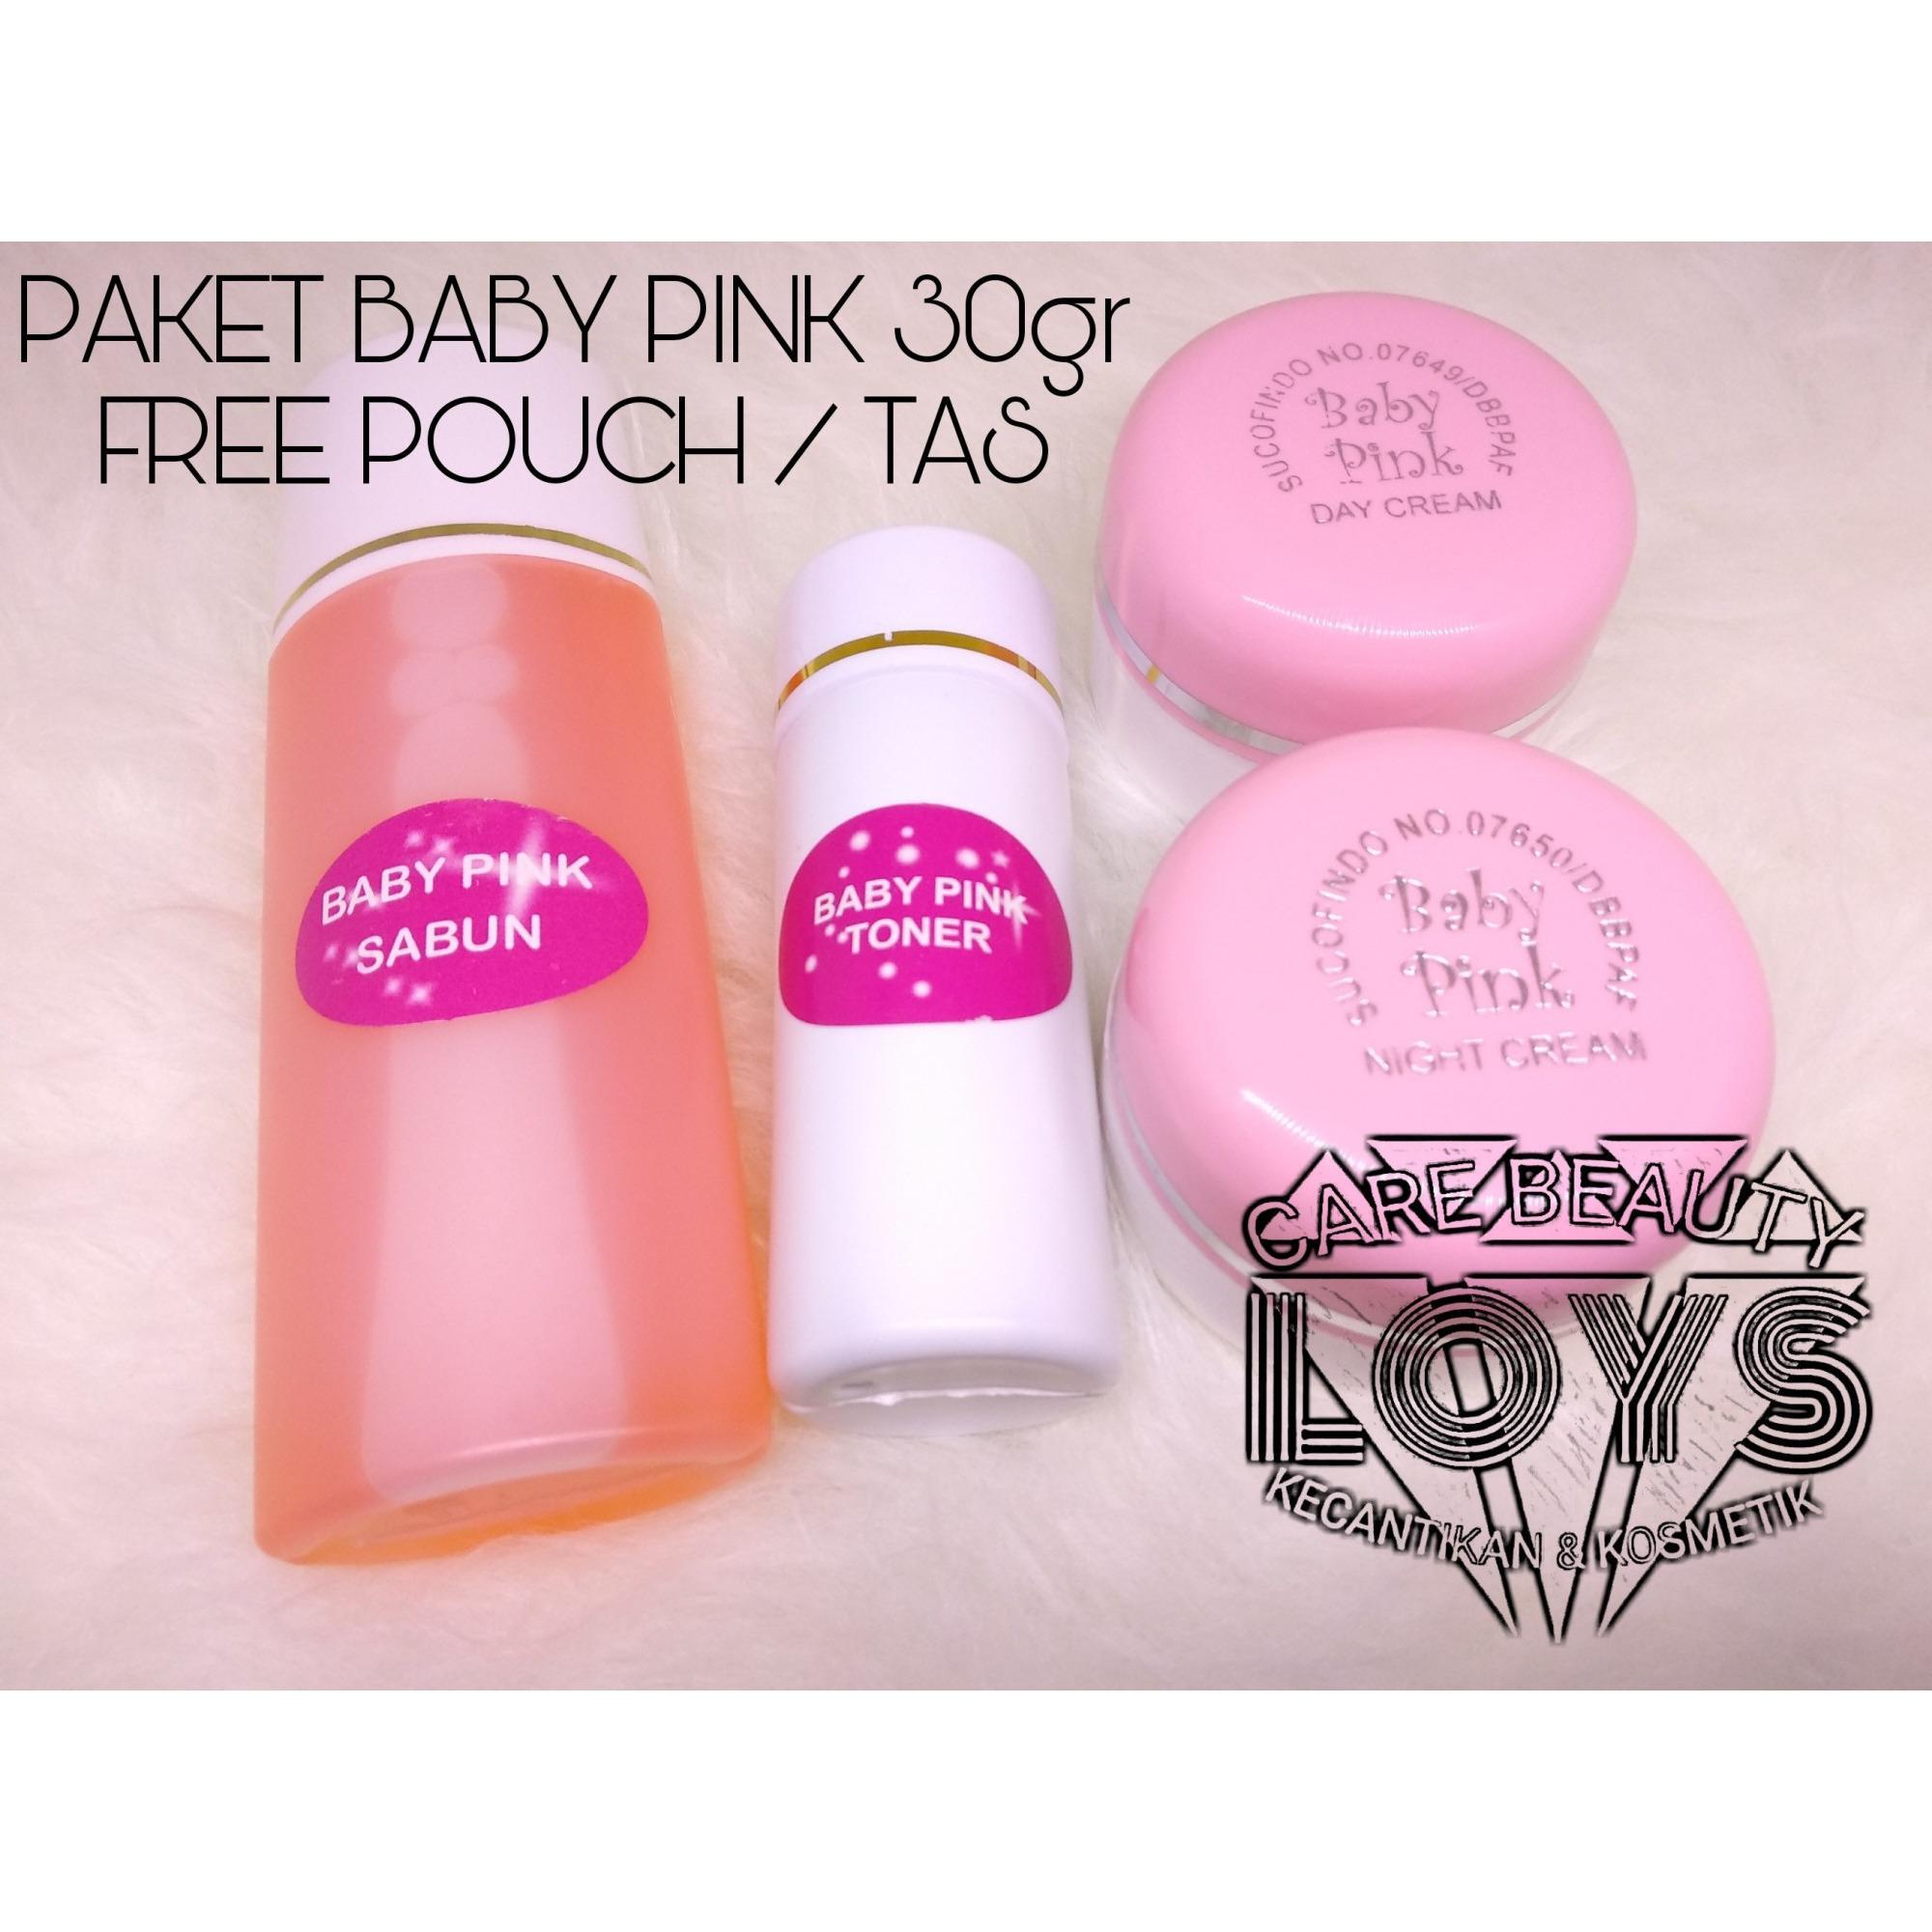 Paket BABY PINK SUCOFINDO ORIGINAL EMBOSS 30gr - Cream Baby Pink Day & Night + Sabun + Toner